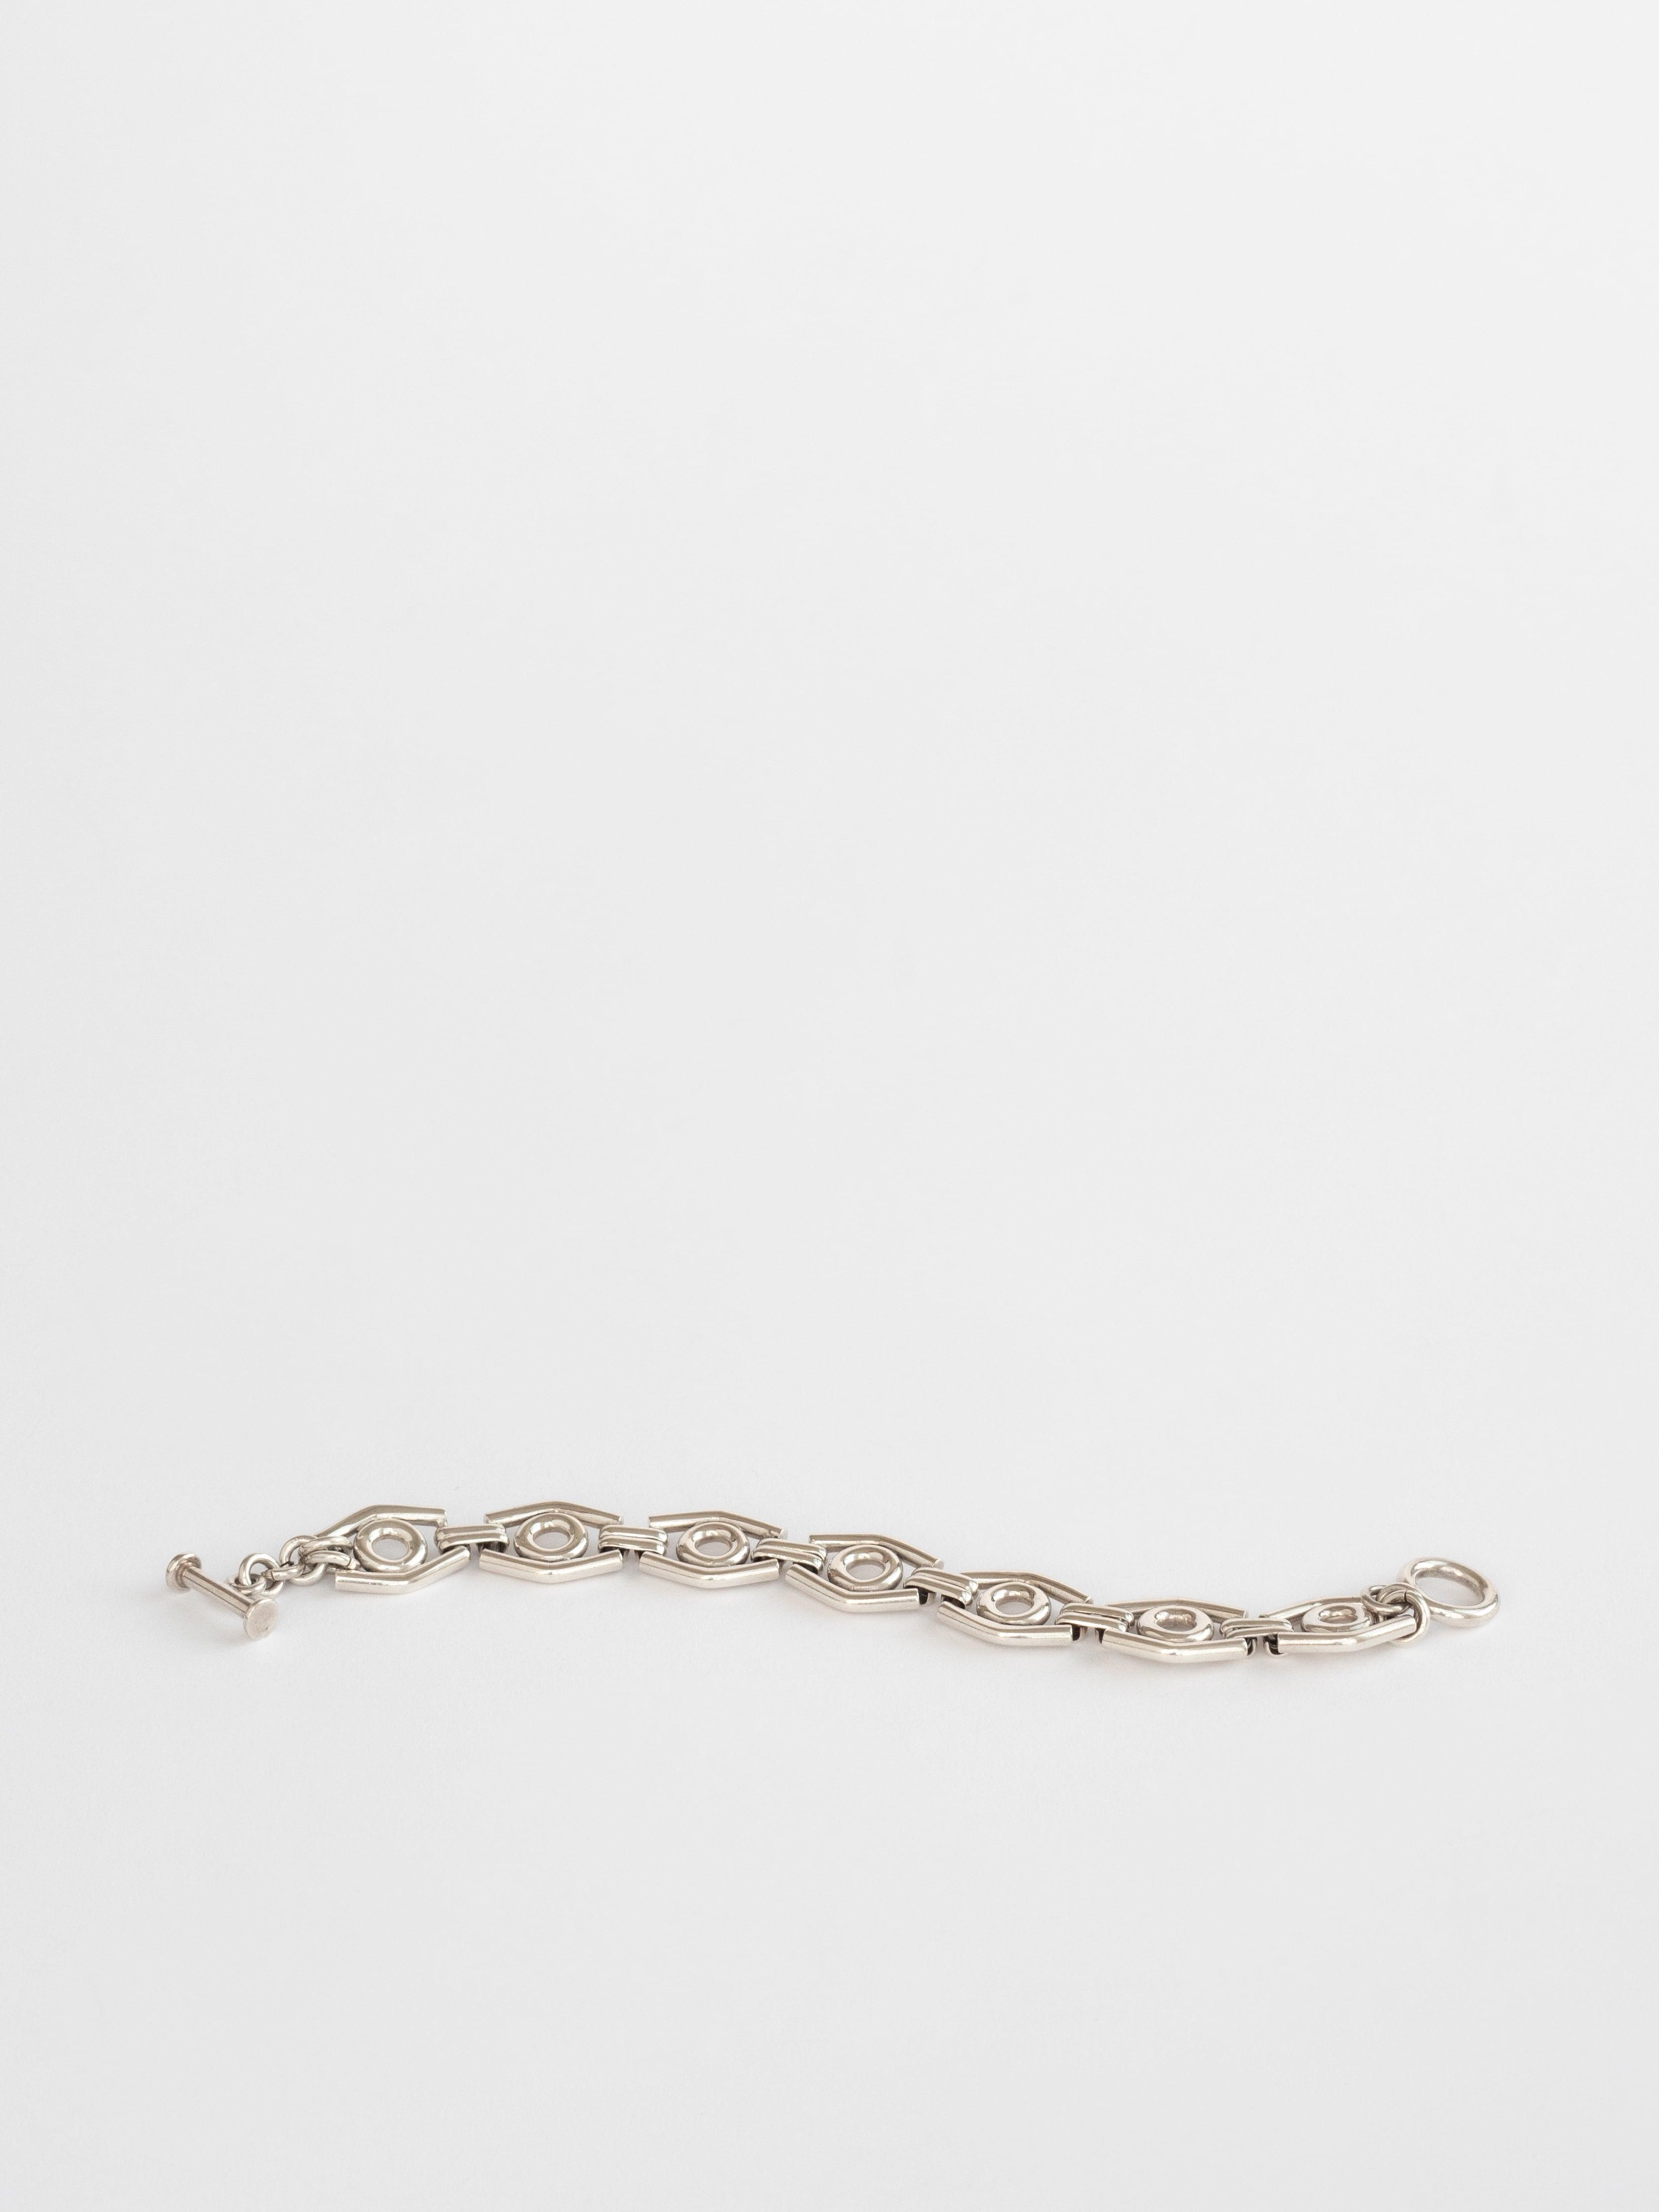 Modern Bracelet / Mexico